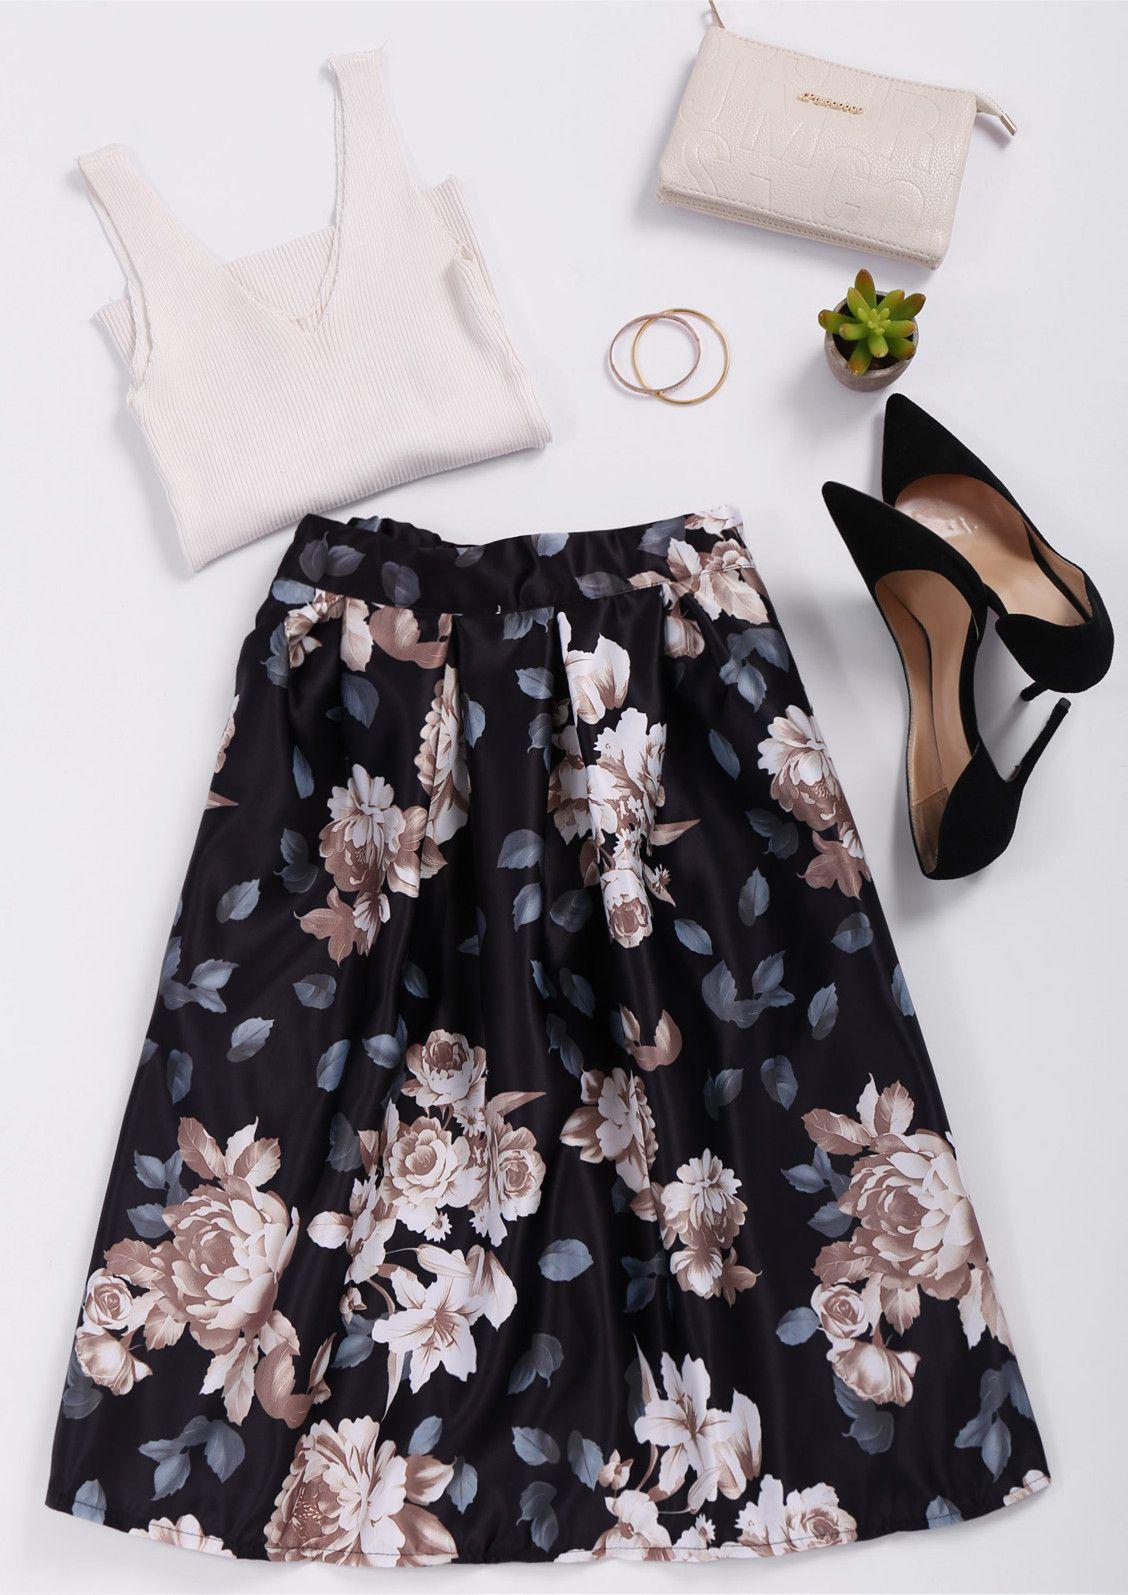 8953bddec5 $16.79 High Waist Floral Print A Line Skirt - Black | spring ...